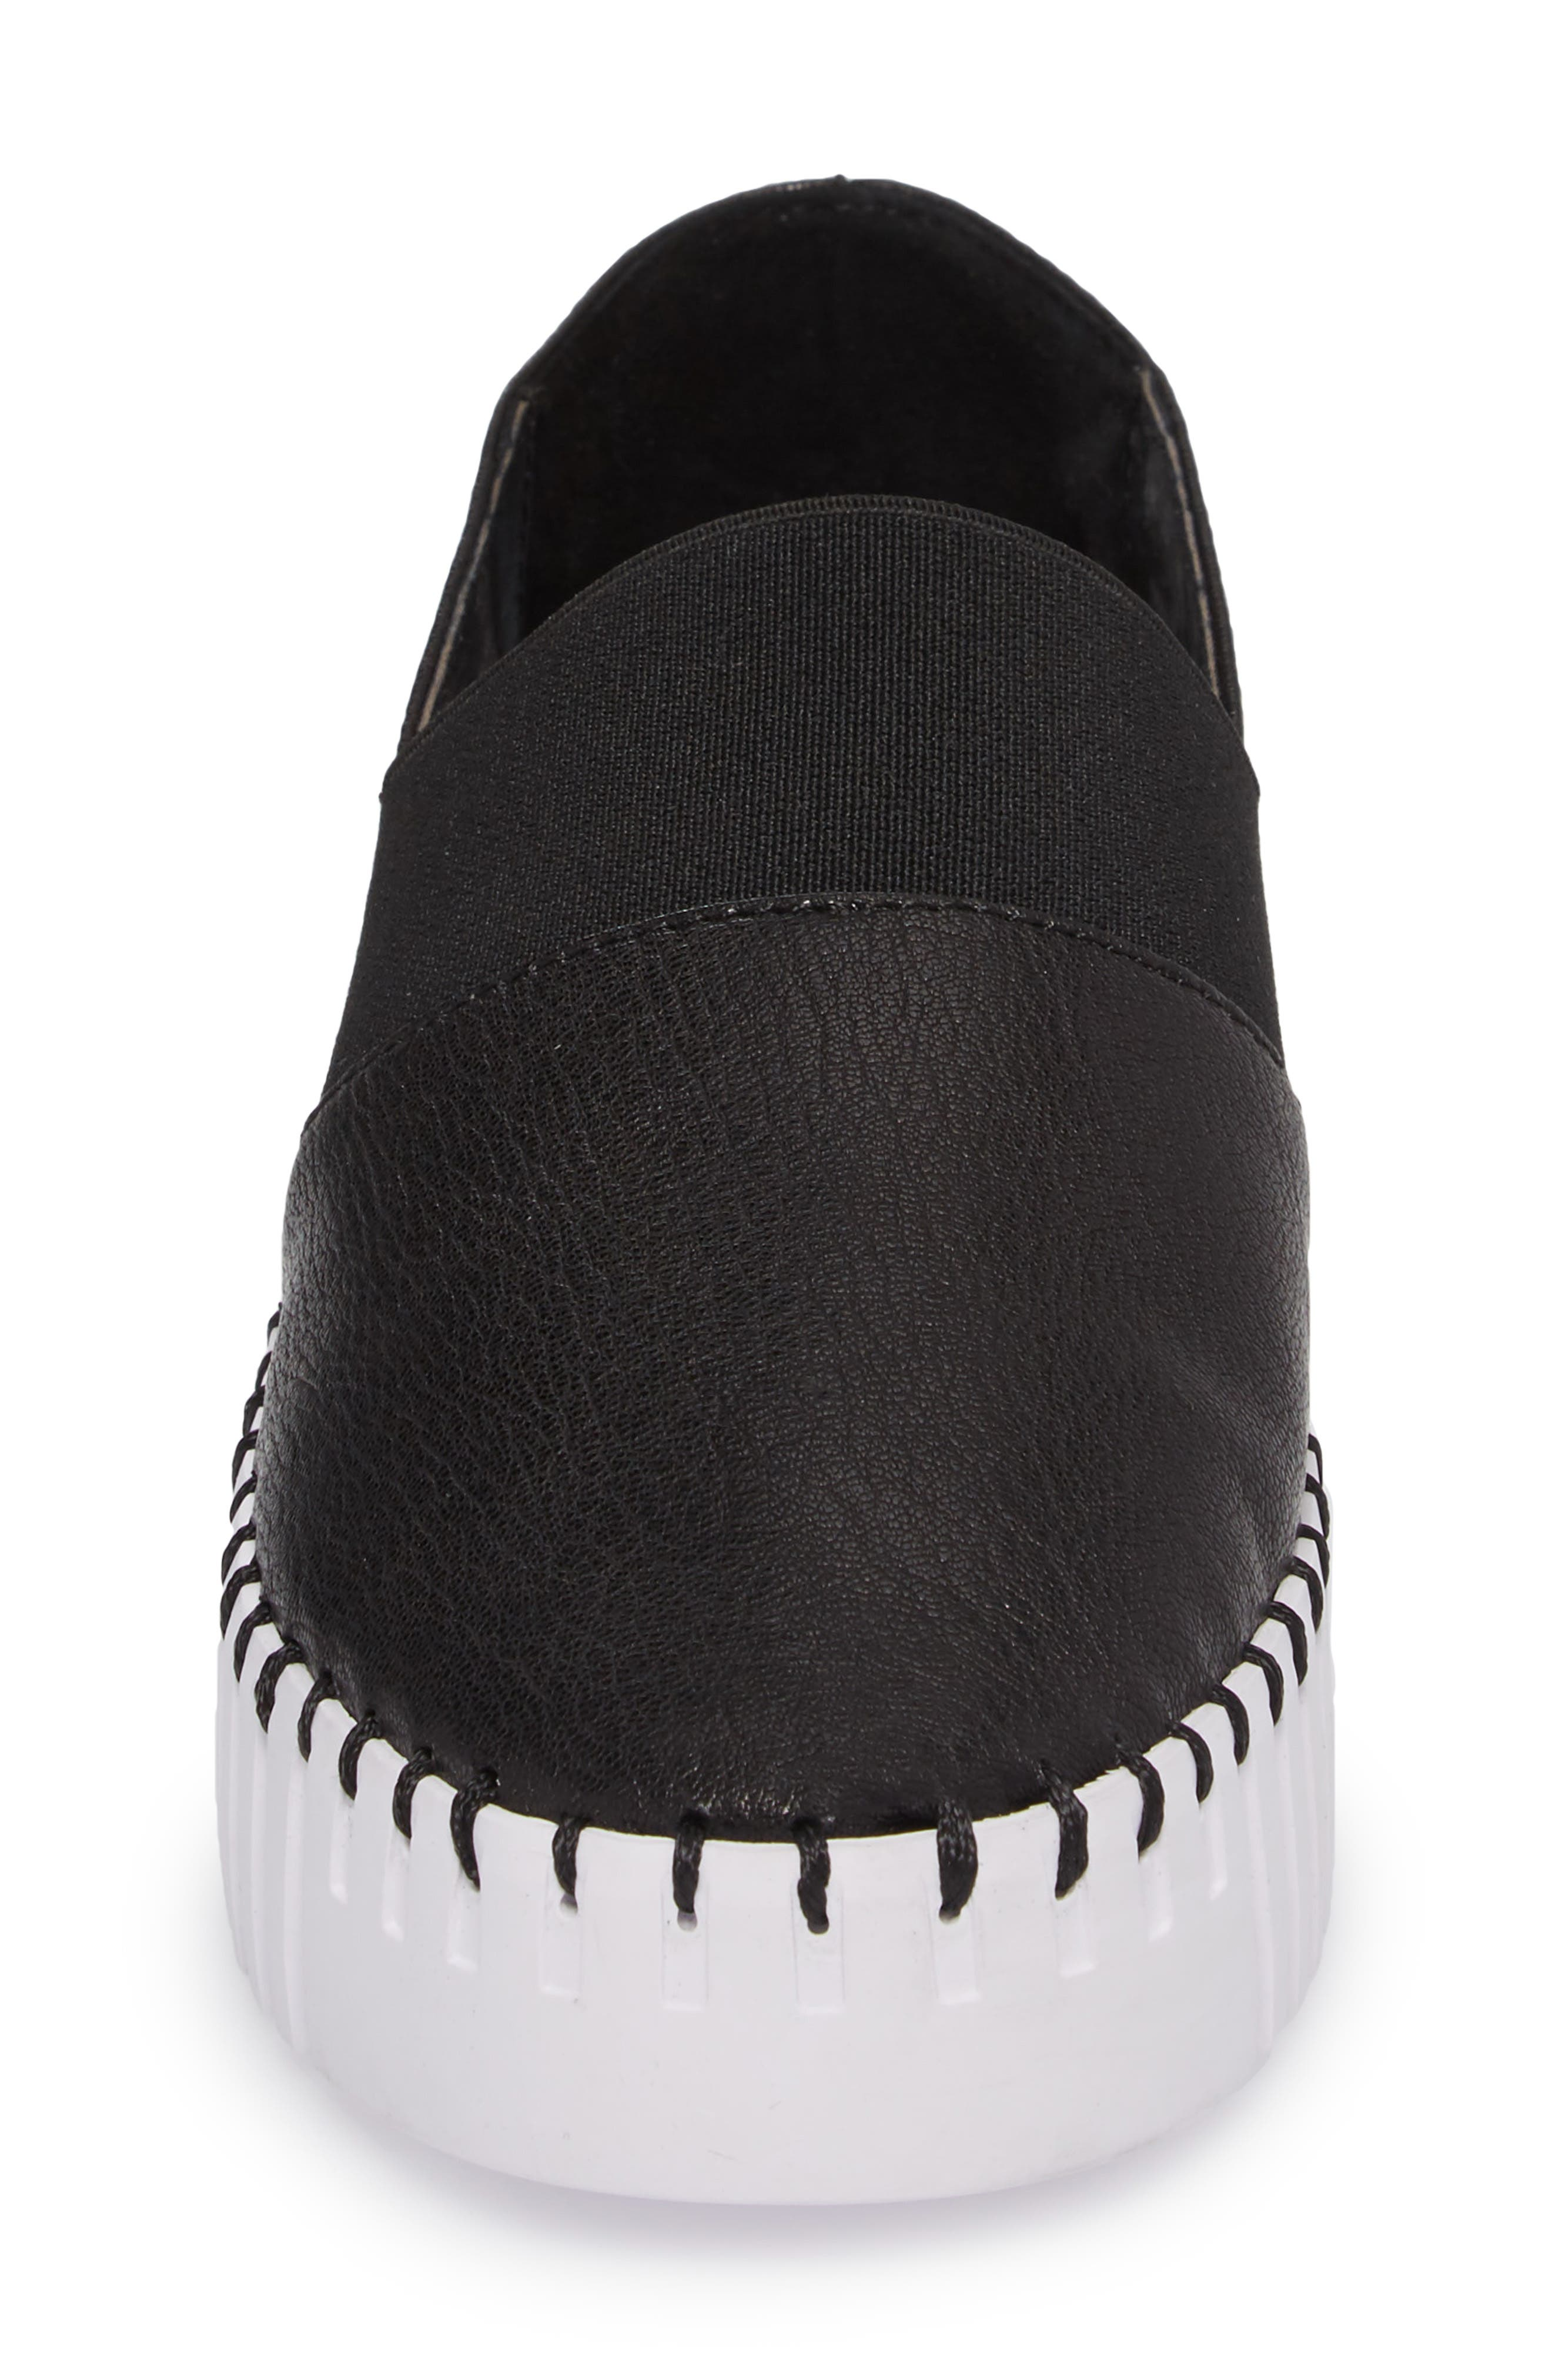 Cube Slip-On Platform Sneaker,                             Alternate thumbnail 5, color,                             Black Leather